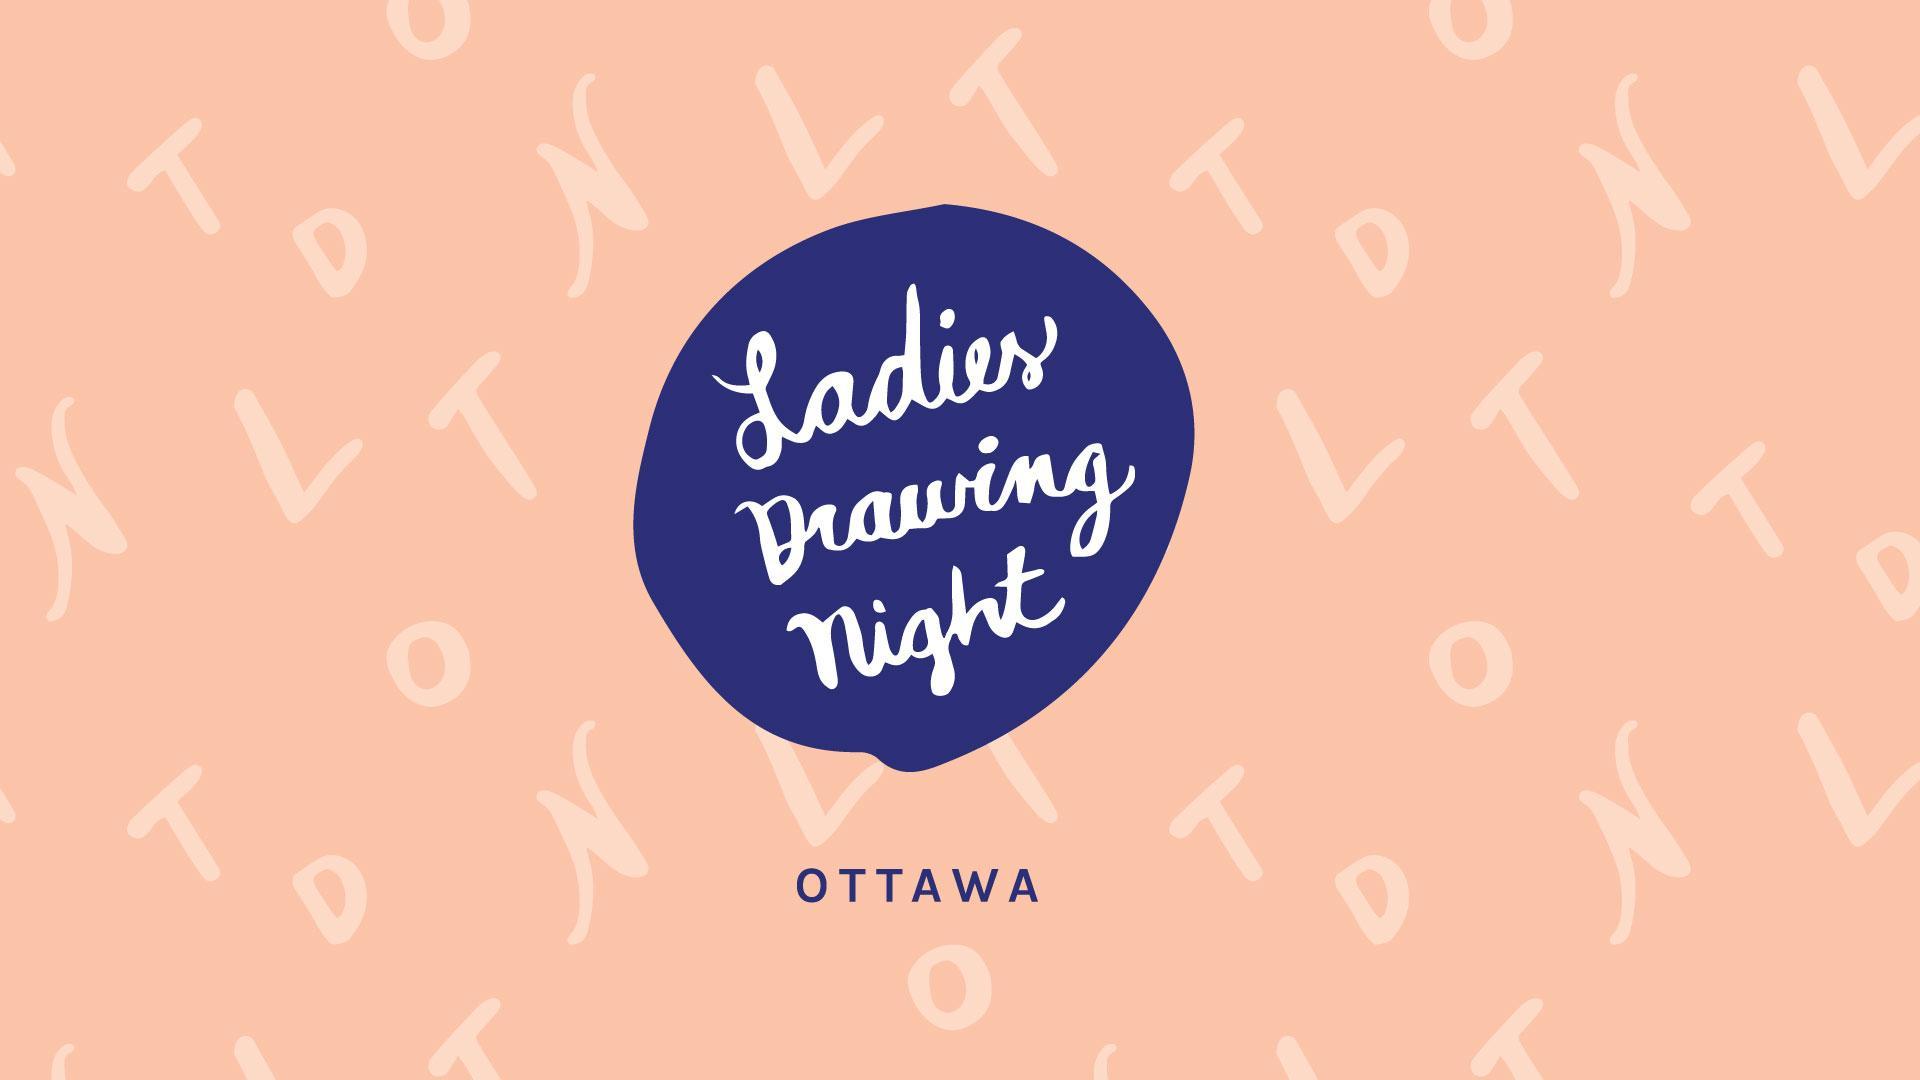 Ladies Drawing Night Ottawa: February